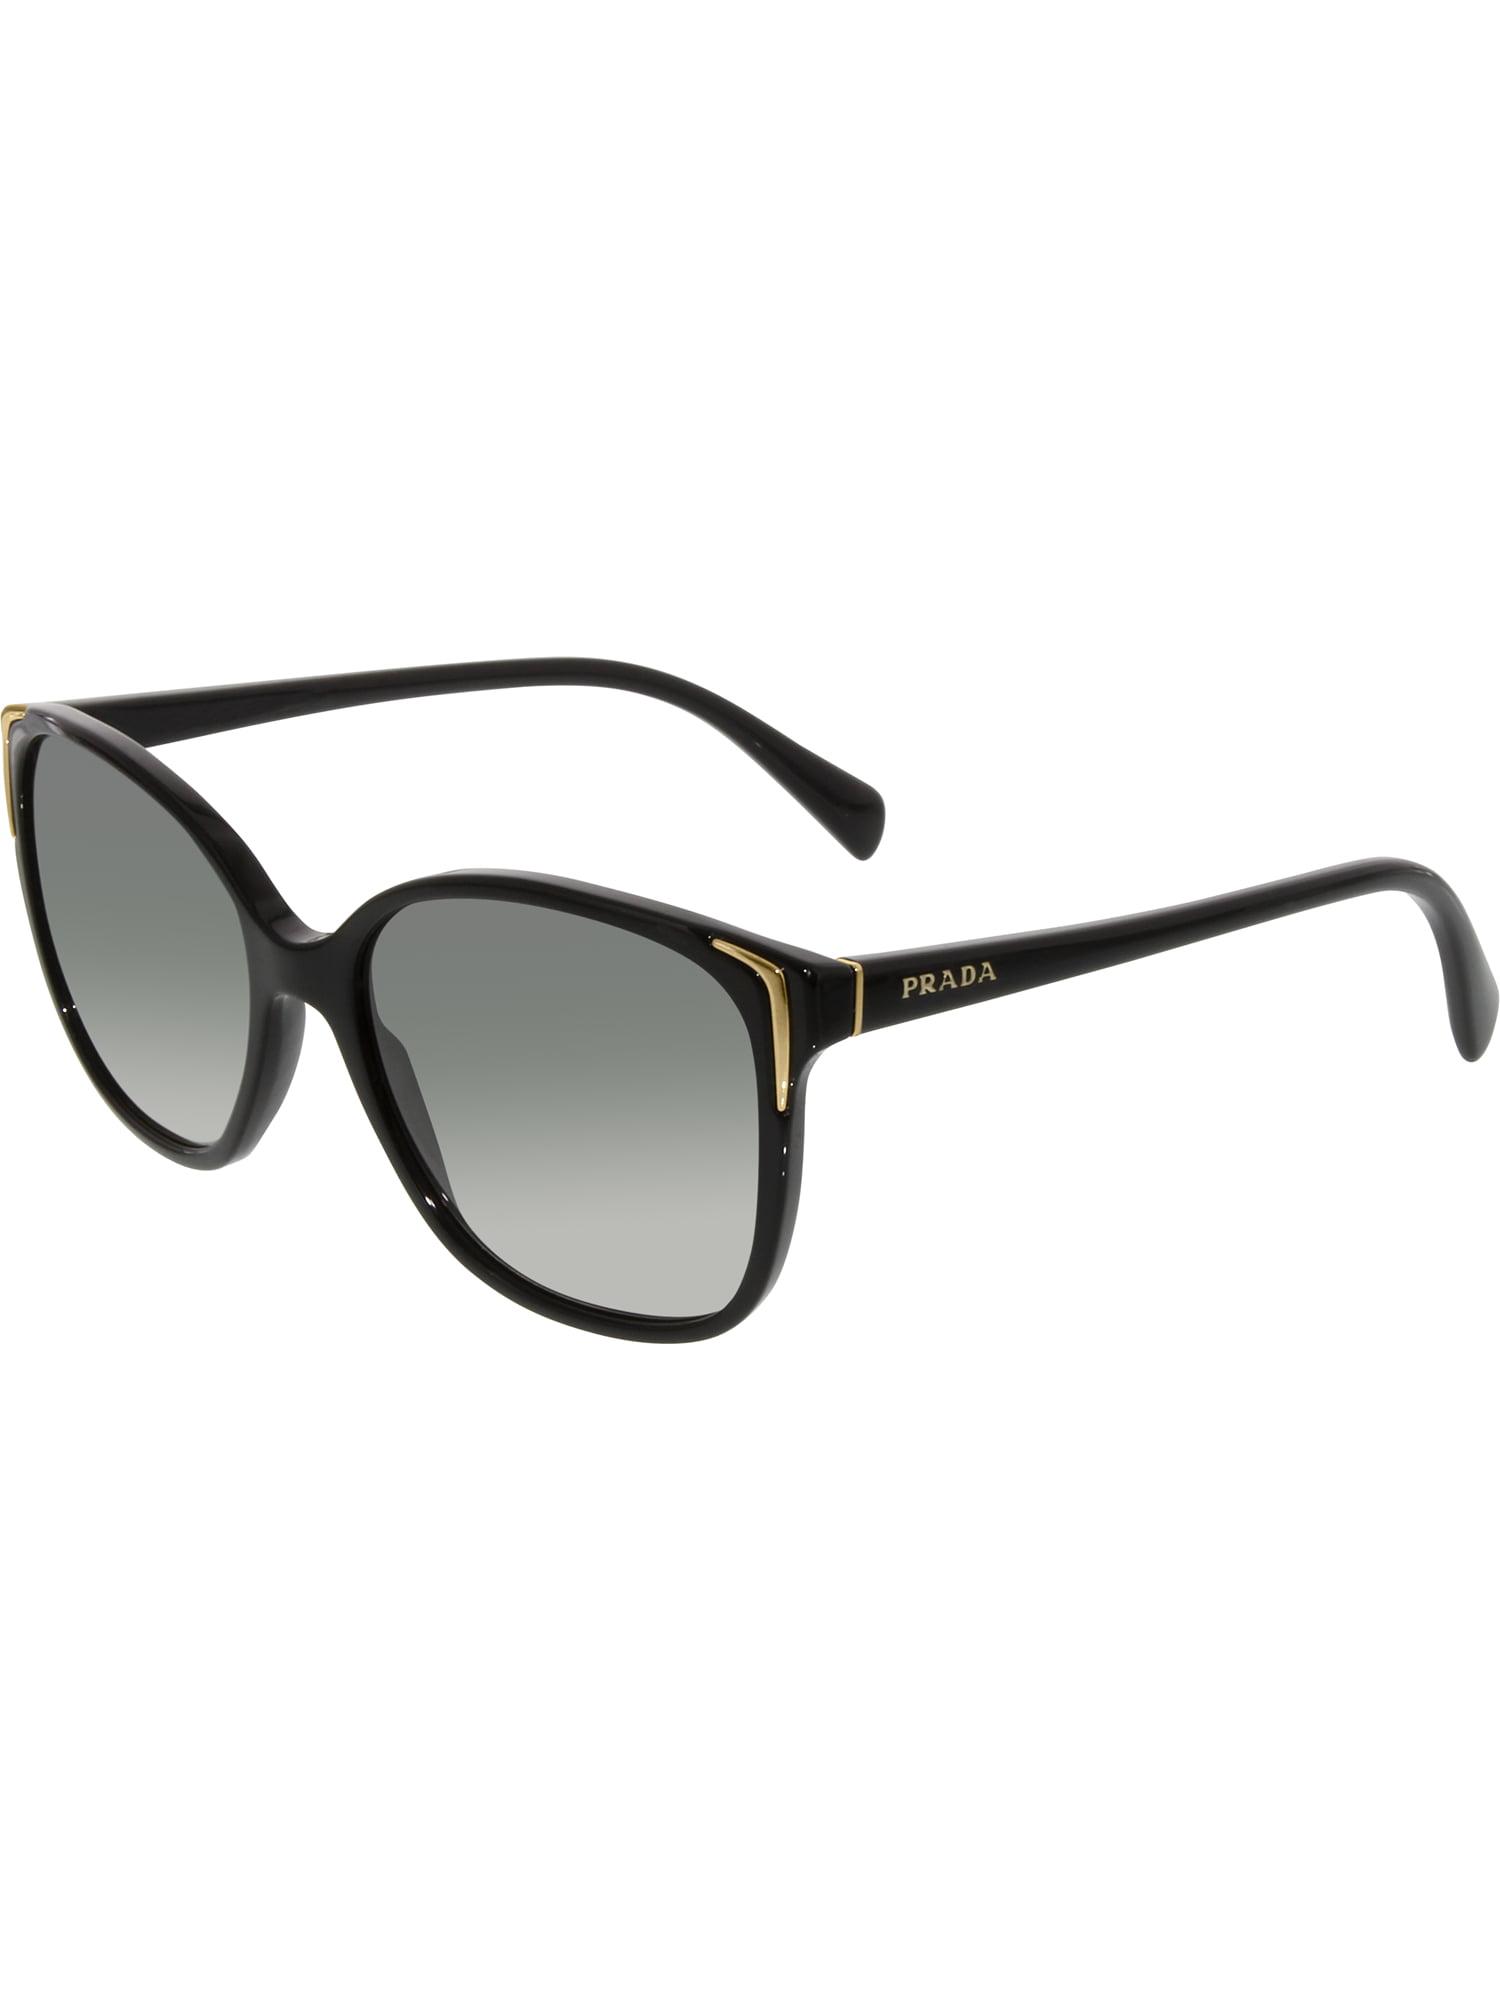 76994349cf41 Prada - Prada Women s Gradient PR01OS-1AB3M1-55 Black Cat Eye Sunglasses -  Walmart.com